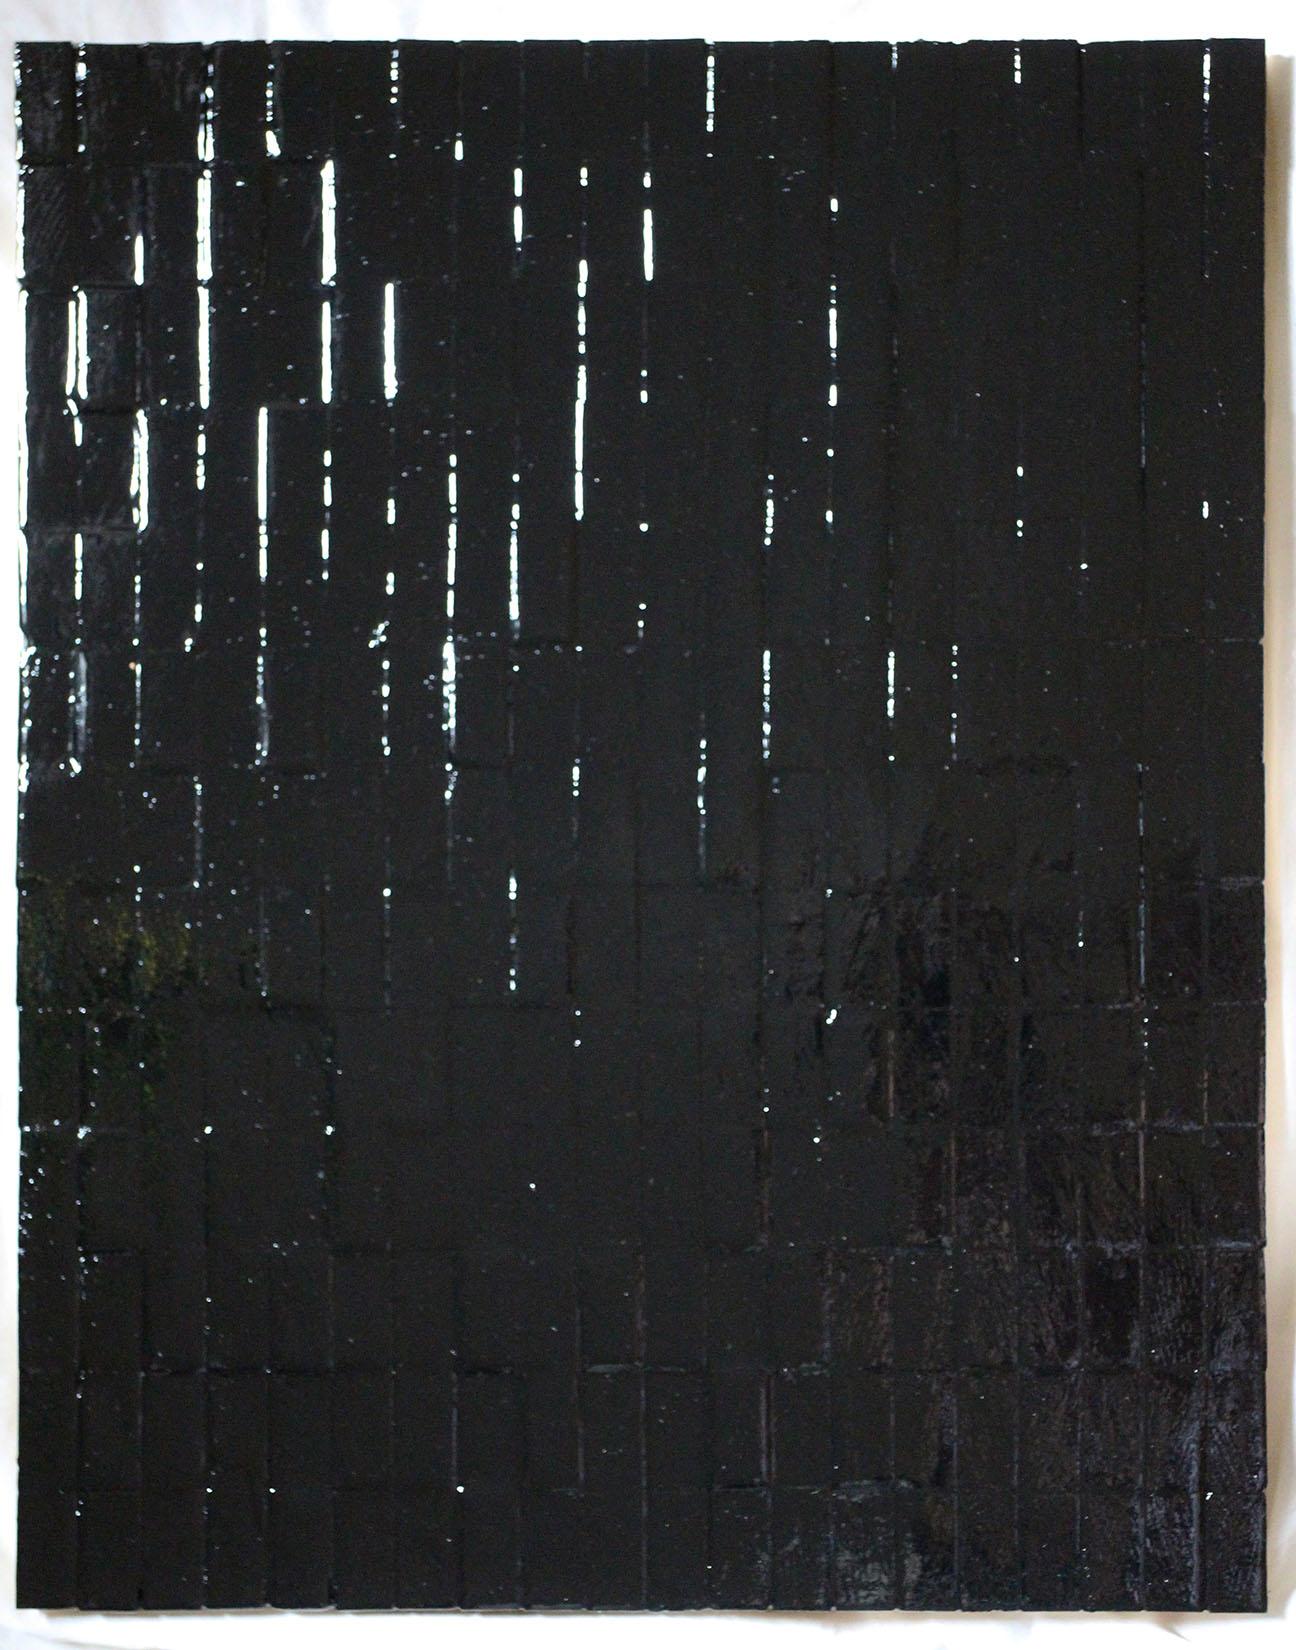 Black Painting 2 1.6.15